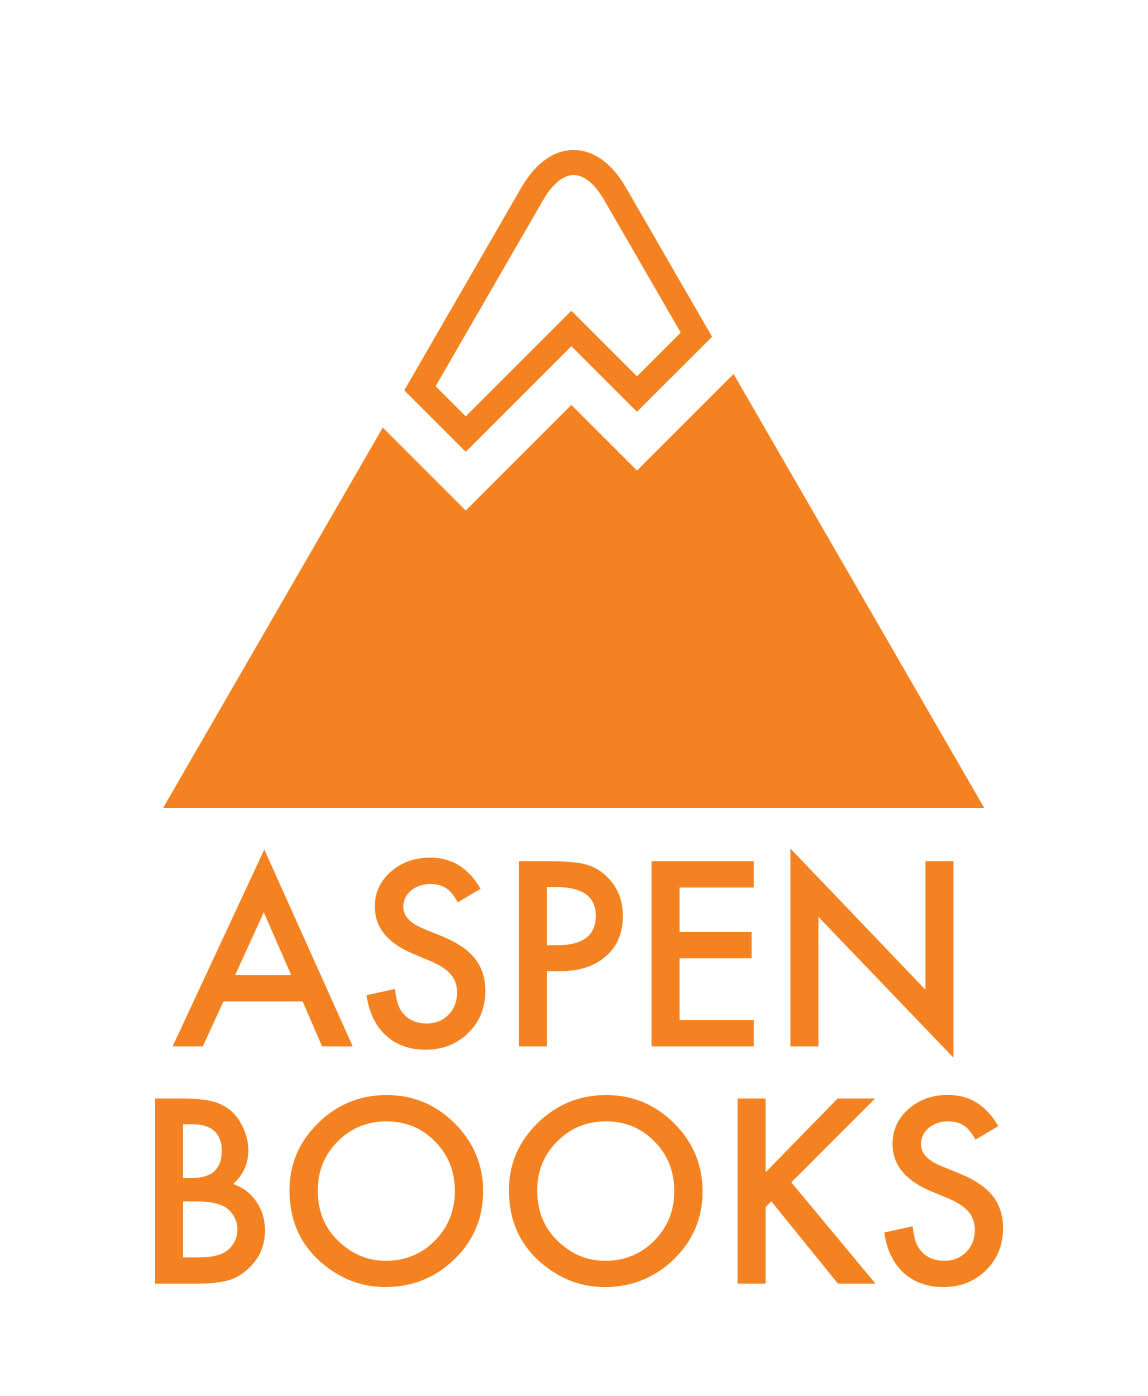 Aspen Books